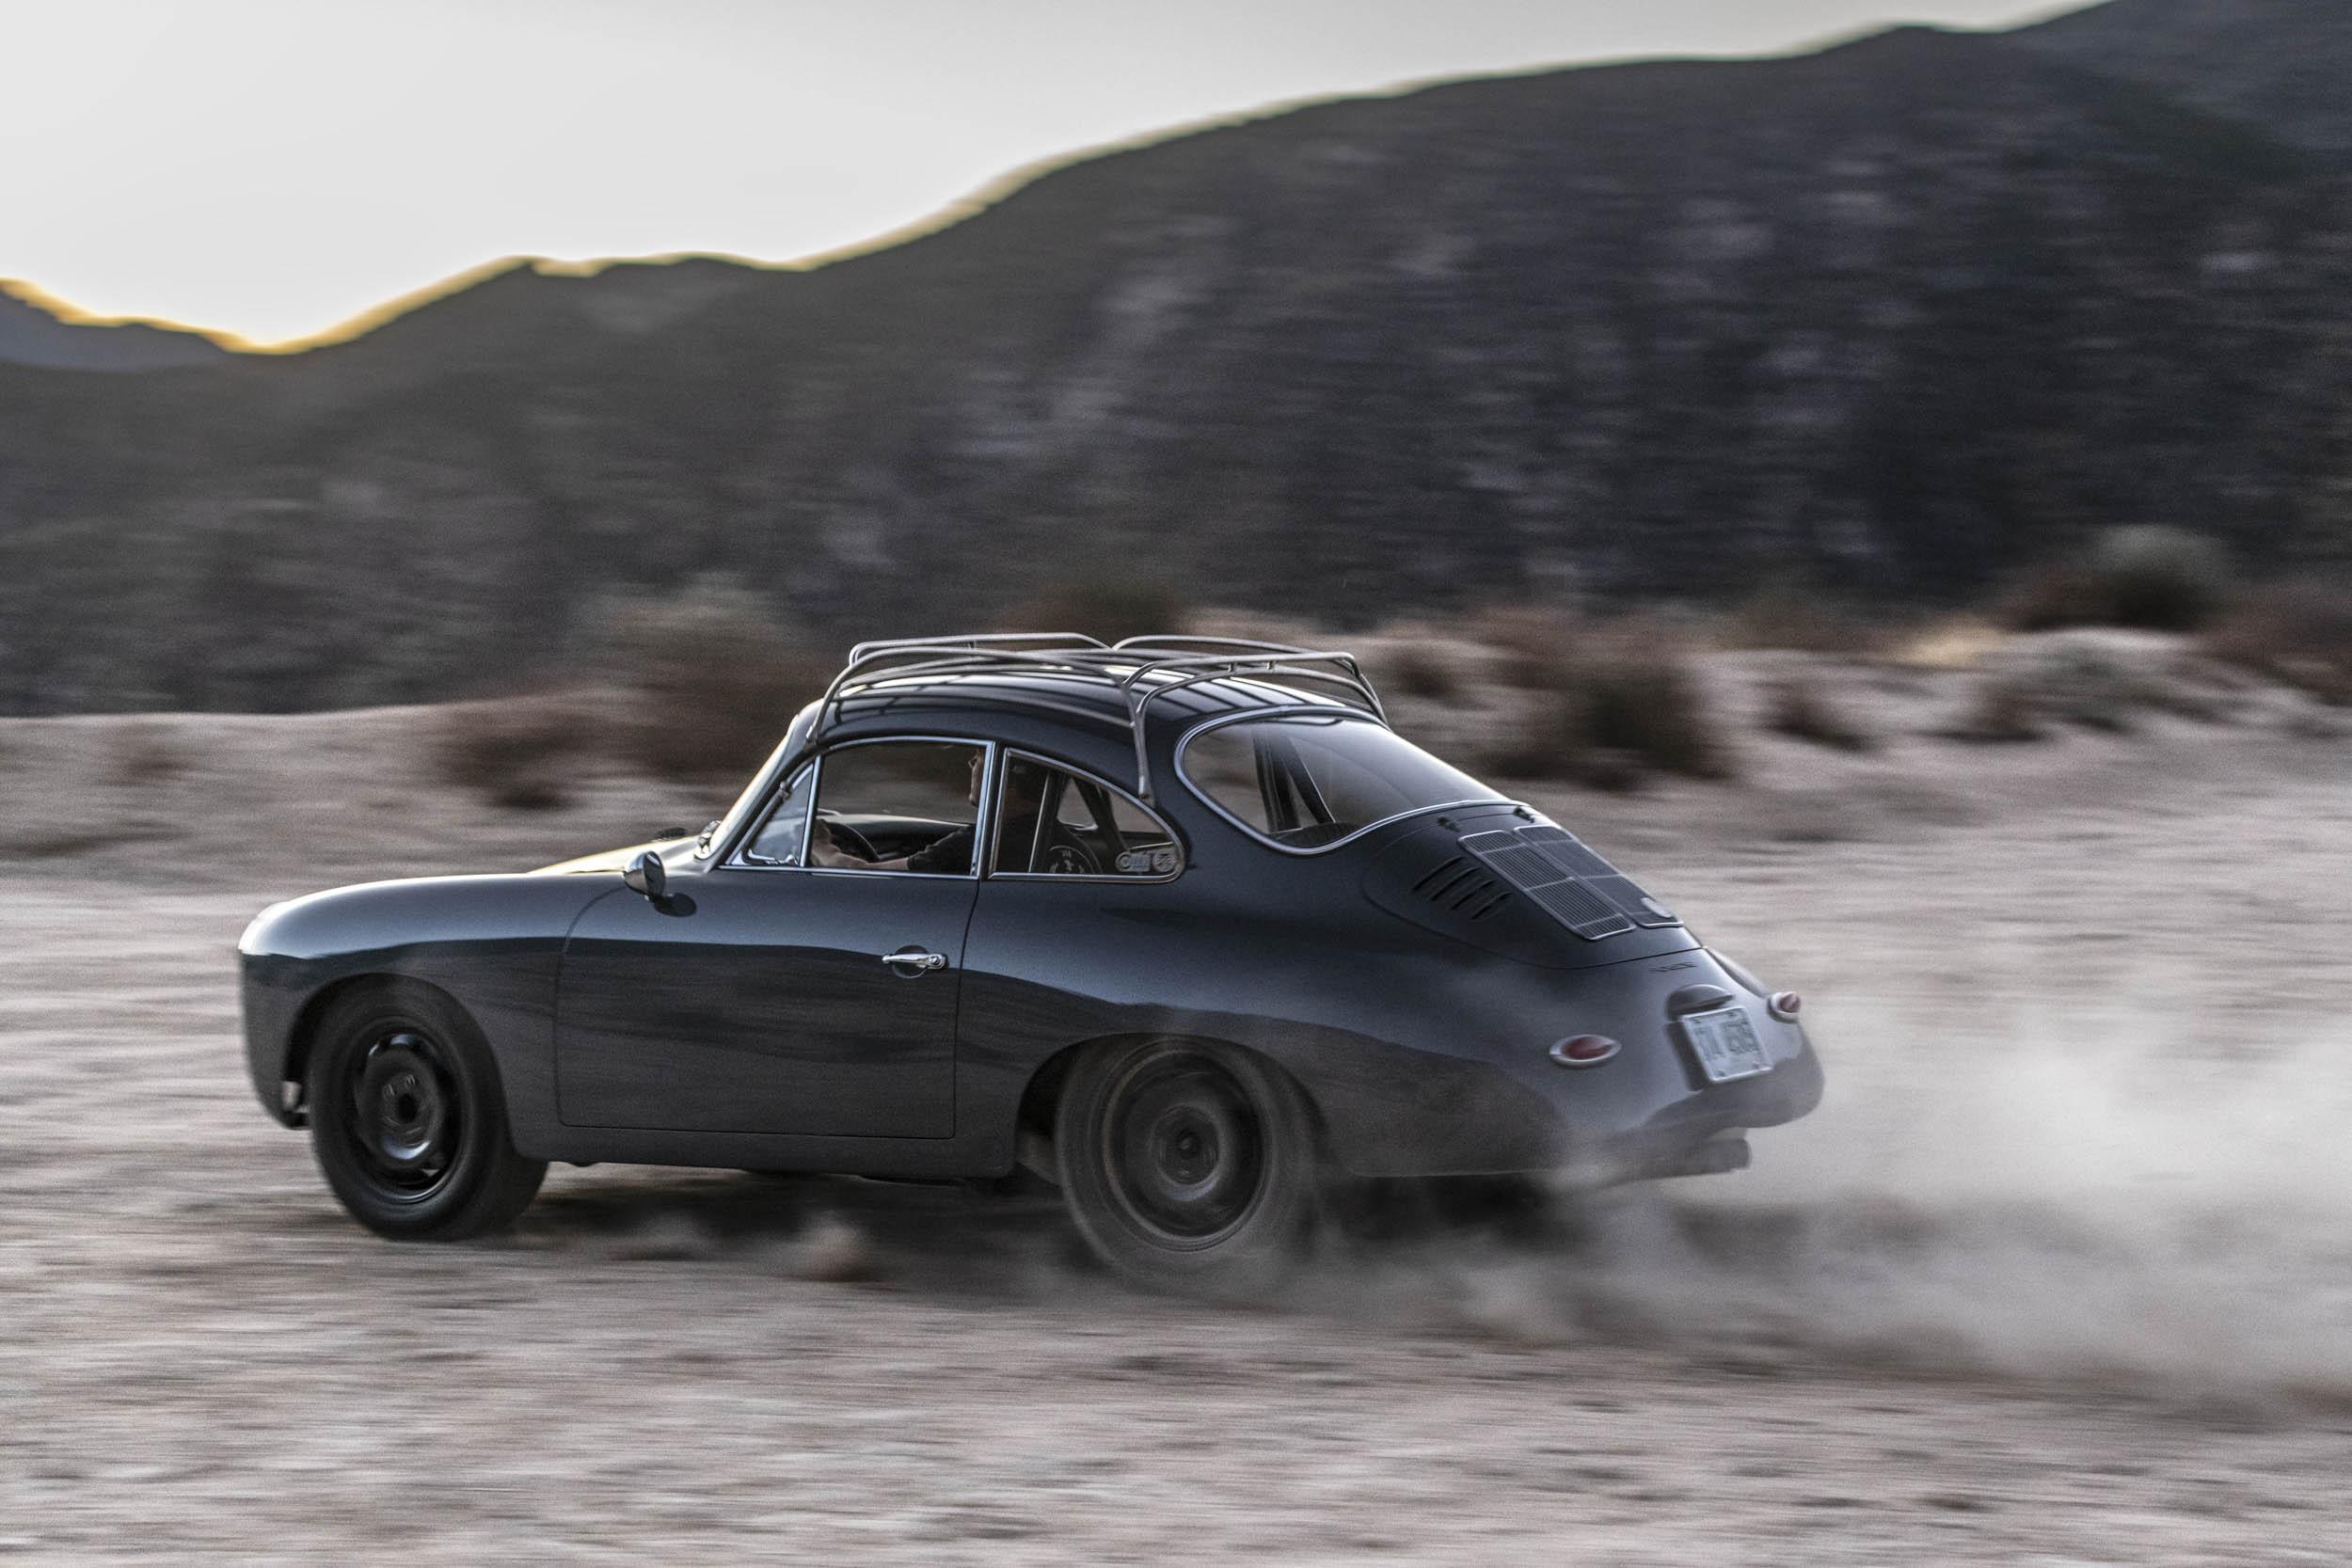 Emory Porsche 356 C4S Allrad kicking up dirt